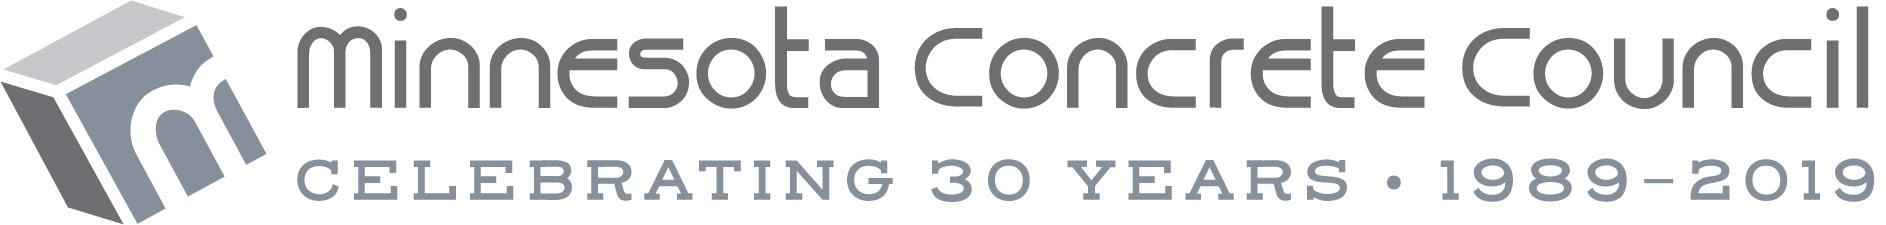 mcc 30 yrs logo a